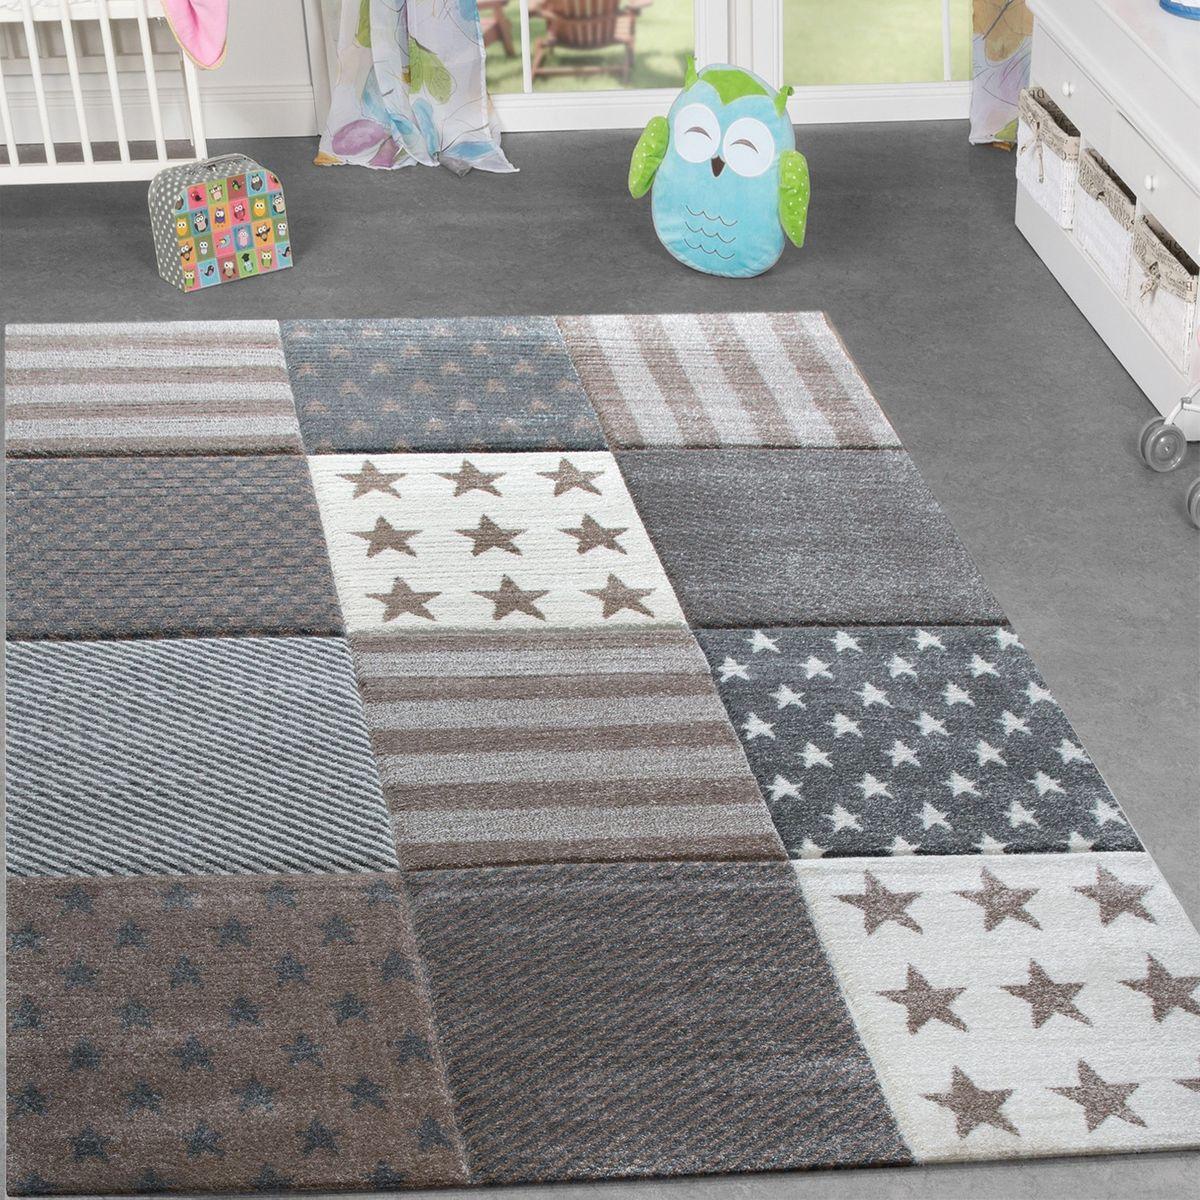 Full Size of Kinderzimmer Teppiche Sofa Regal Regale Wohnzimmer Weiß Kinderzimmer Kinderzimmer Teppiche